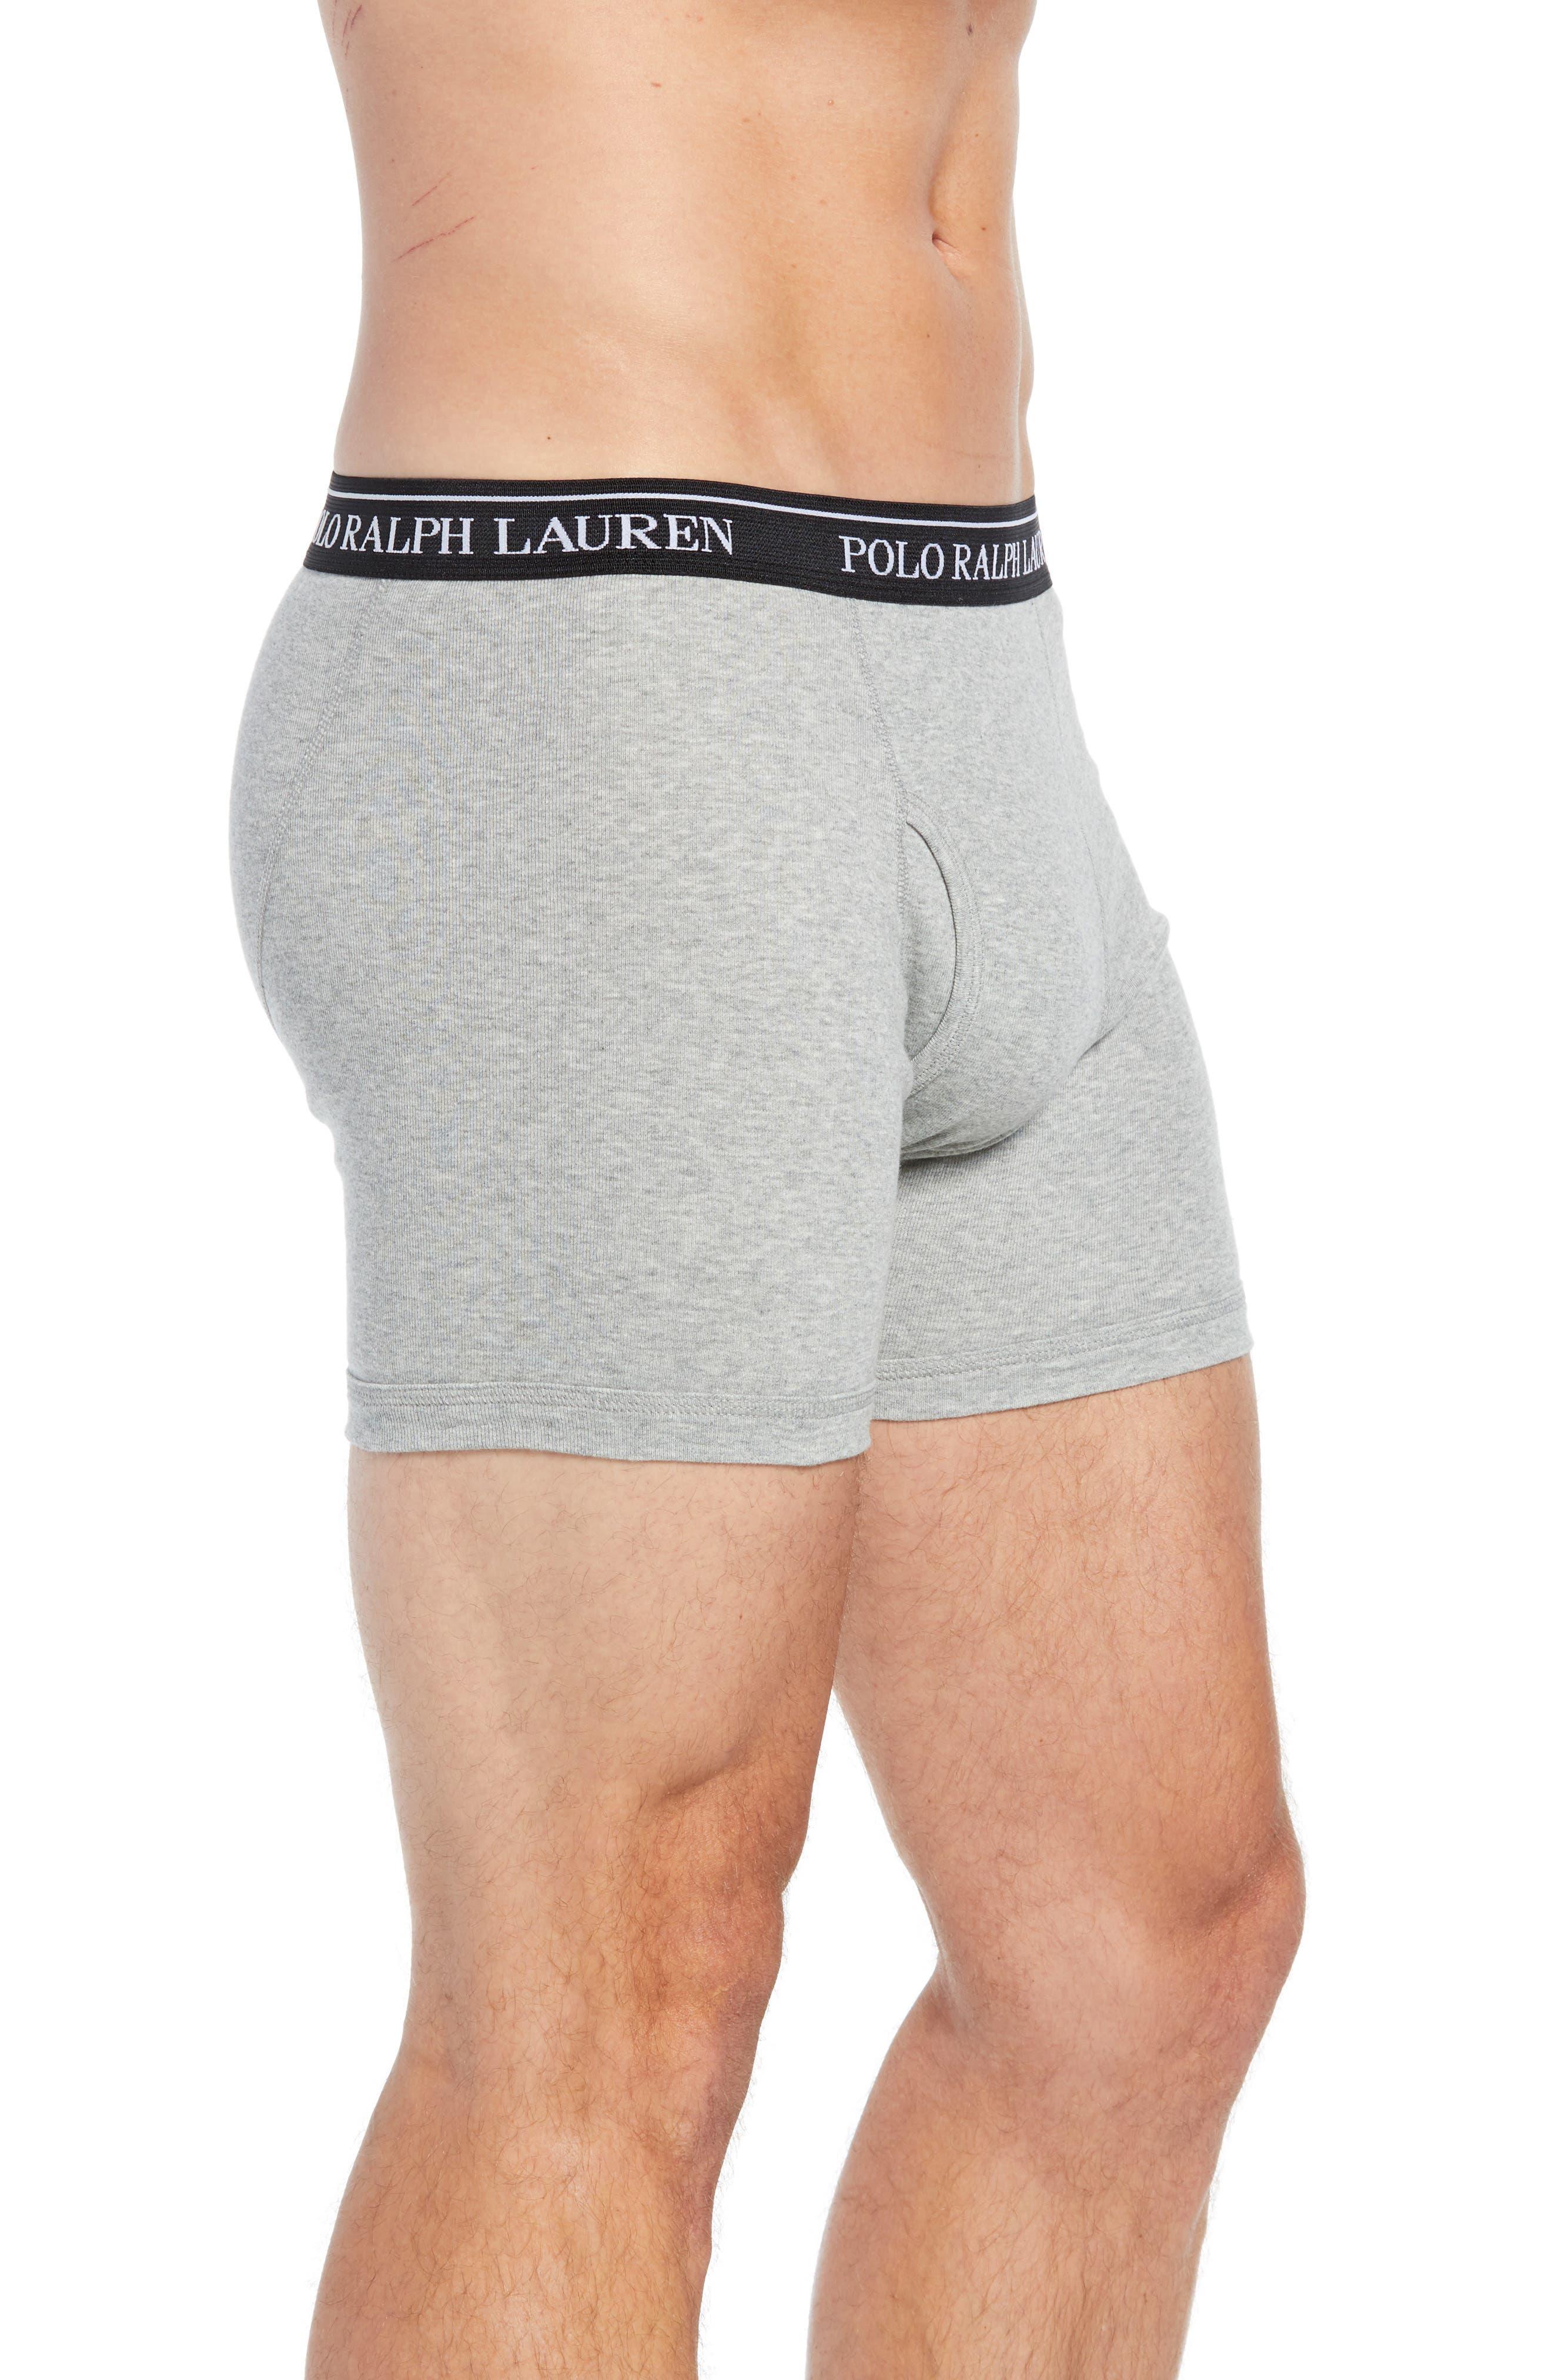 Polo Ralph Lauren 5-Pack Cotton Boxer Briefs,                             Alternate thumbnail 4, color,                             2ANDHTH/MA